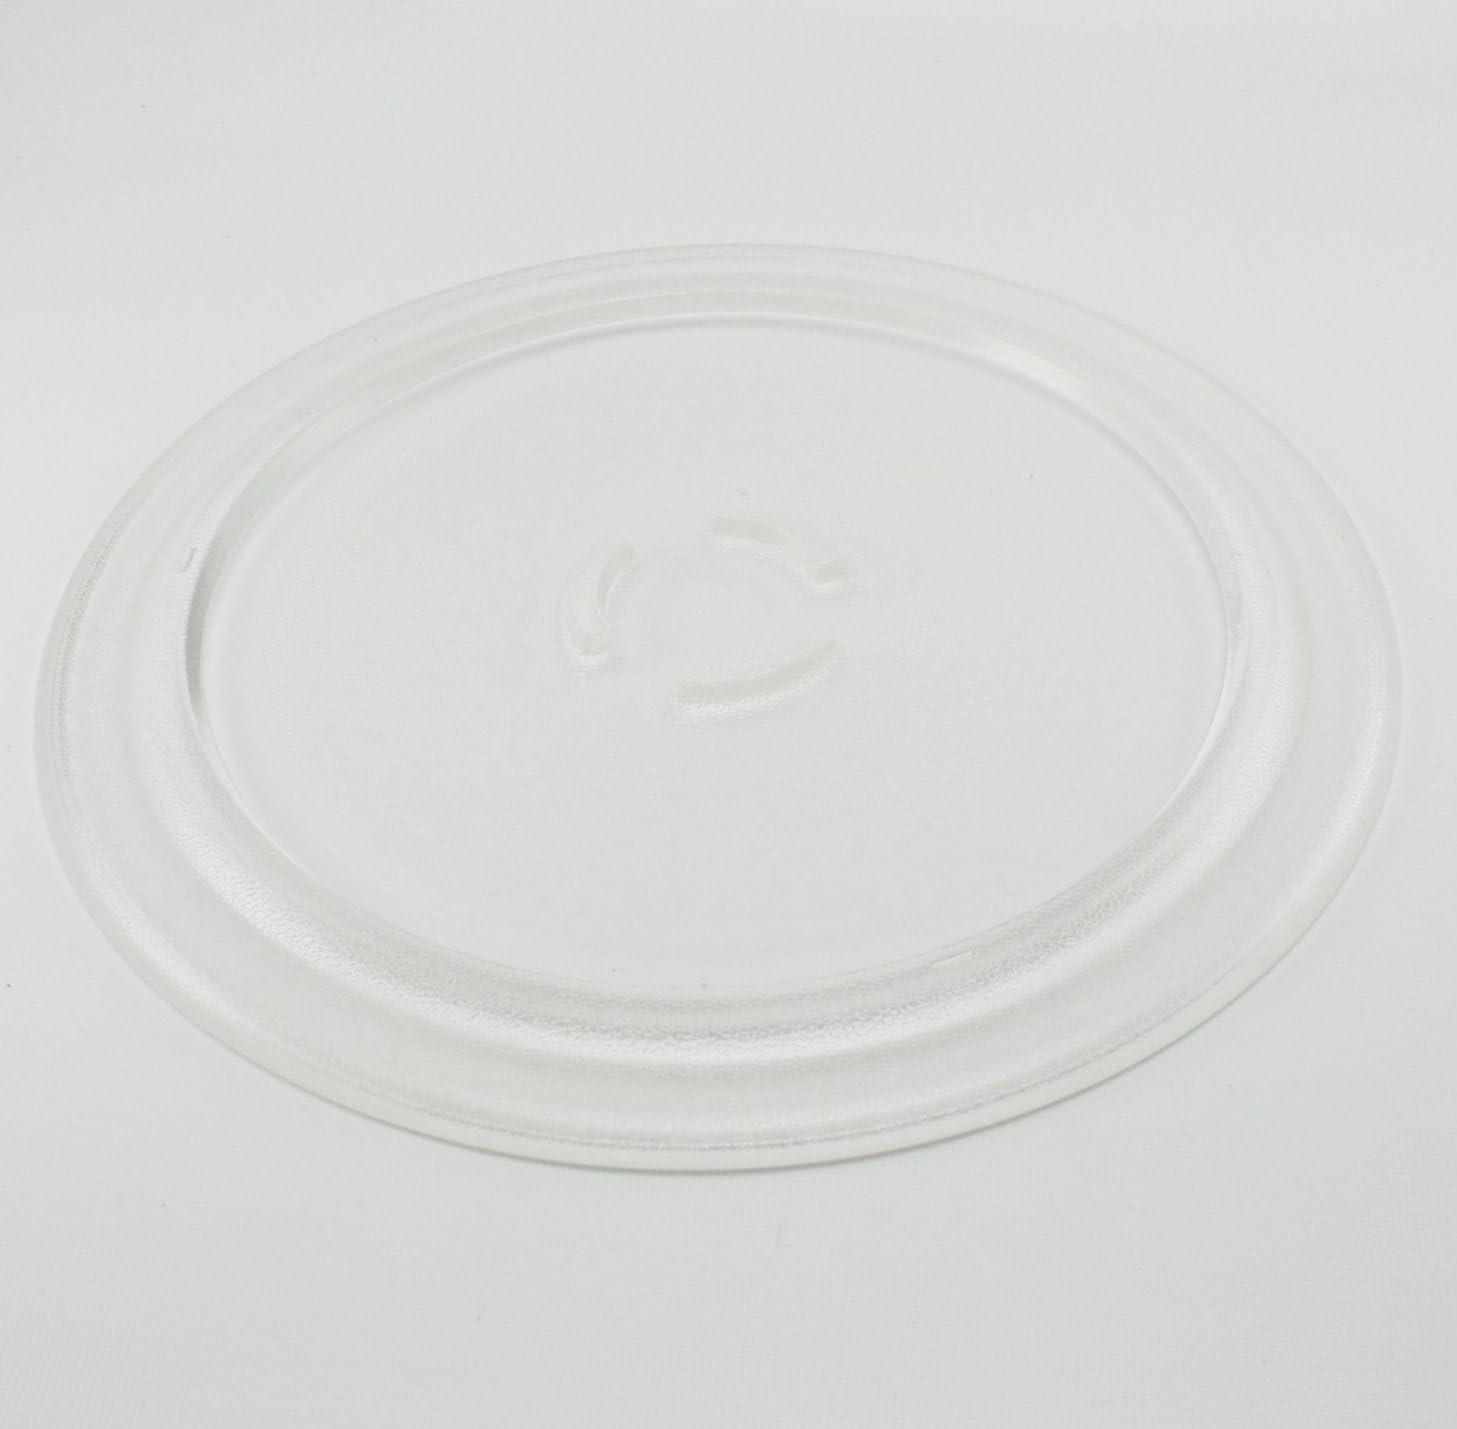 8205992 Whirlpool Microwave Tray-Cook OEM 8205992